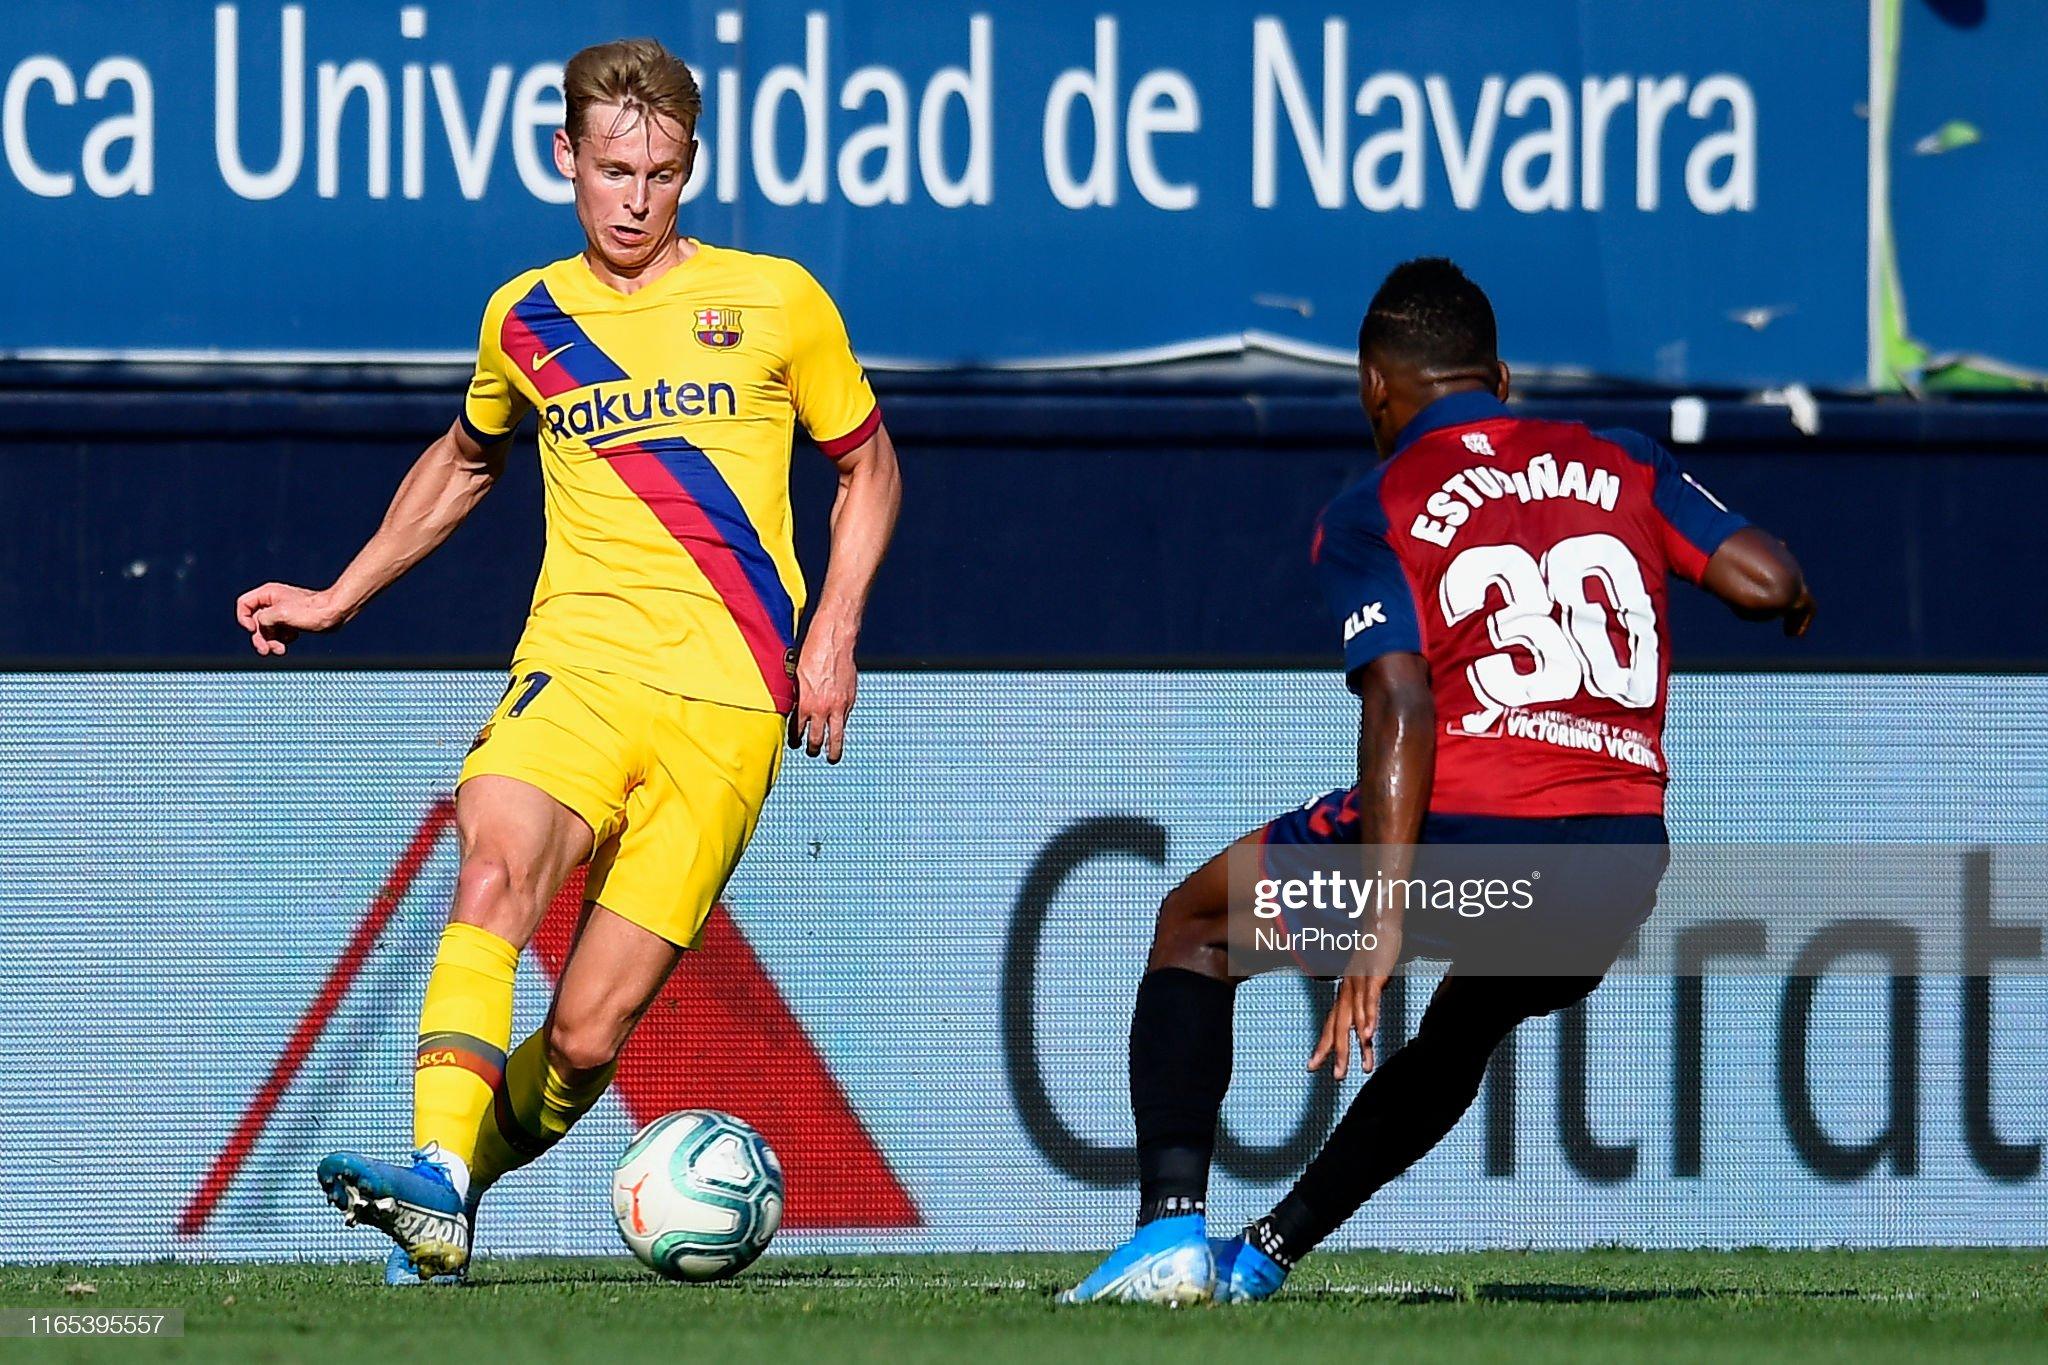 صور مباراة : أوساسونا - برشلونة 2-2 ( 31-08-2019 )  Frenkie-de-jong-of-barcelona-in-action-during-the-liga-match-between-picture-id1165395557?s=2048x2048